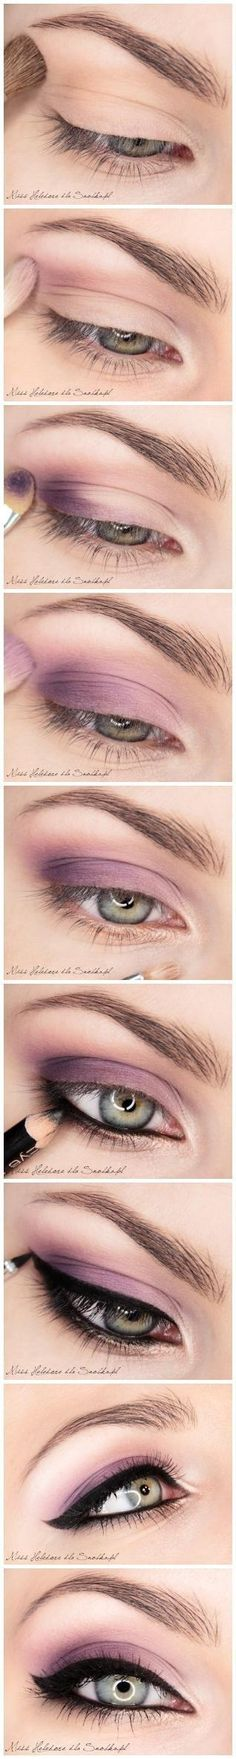 Beautiful eye makeup tutorial www.finditforweddings.com